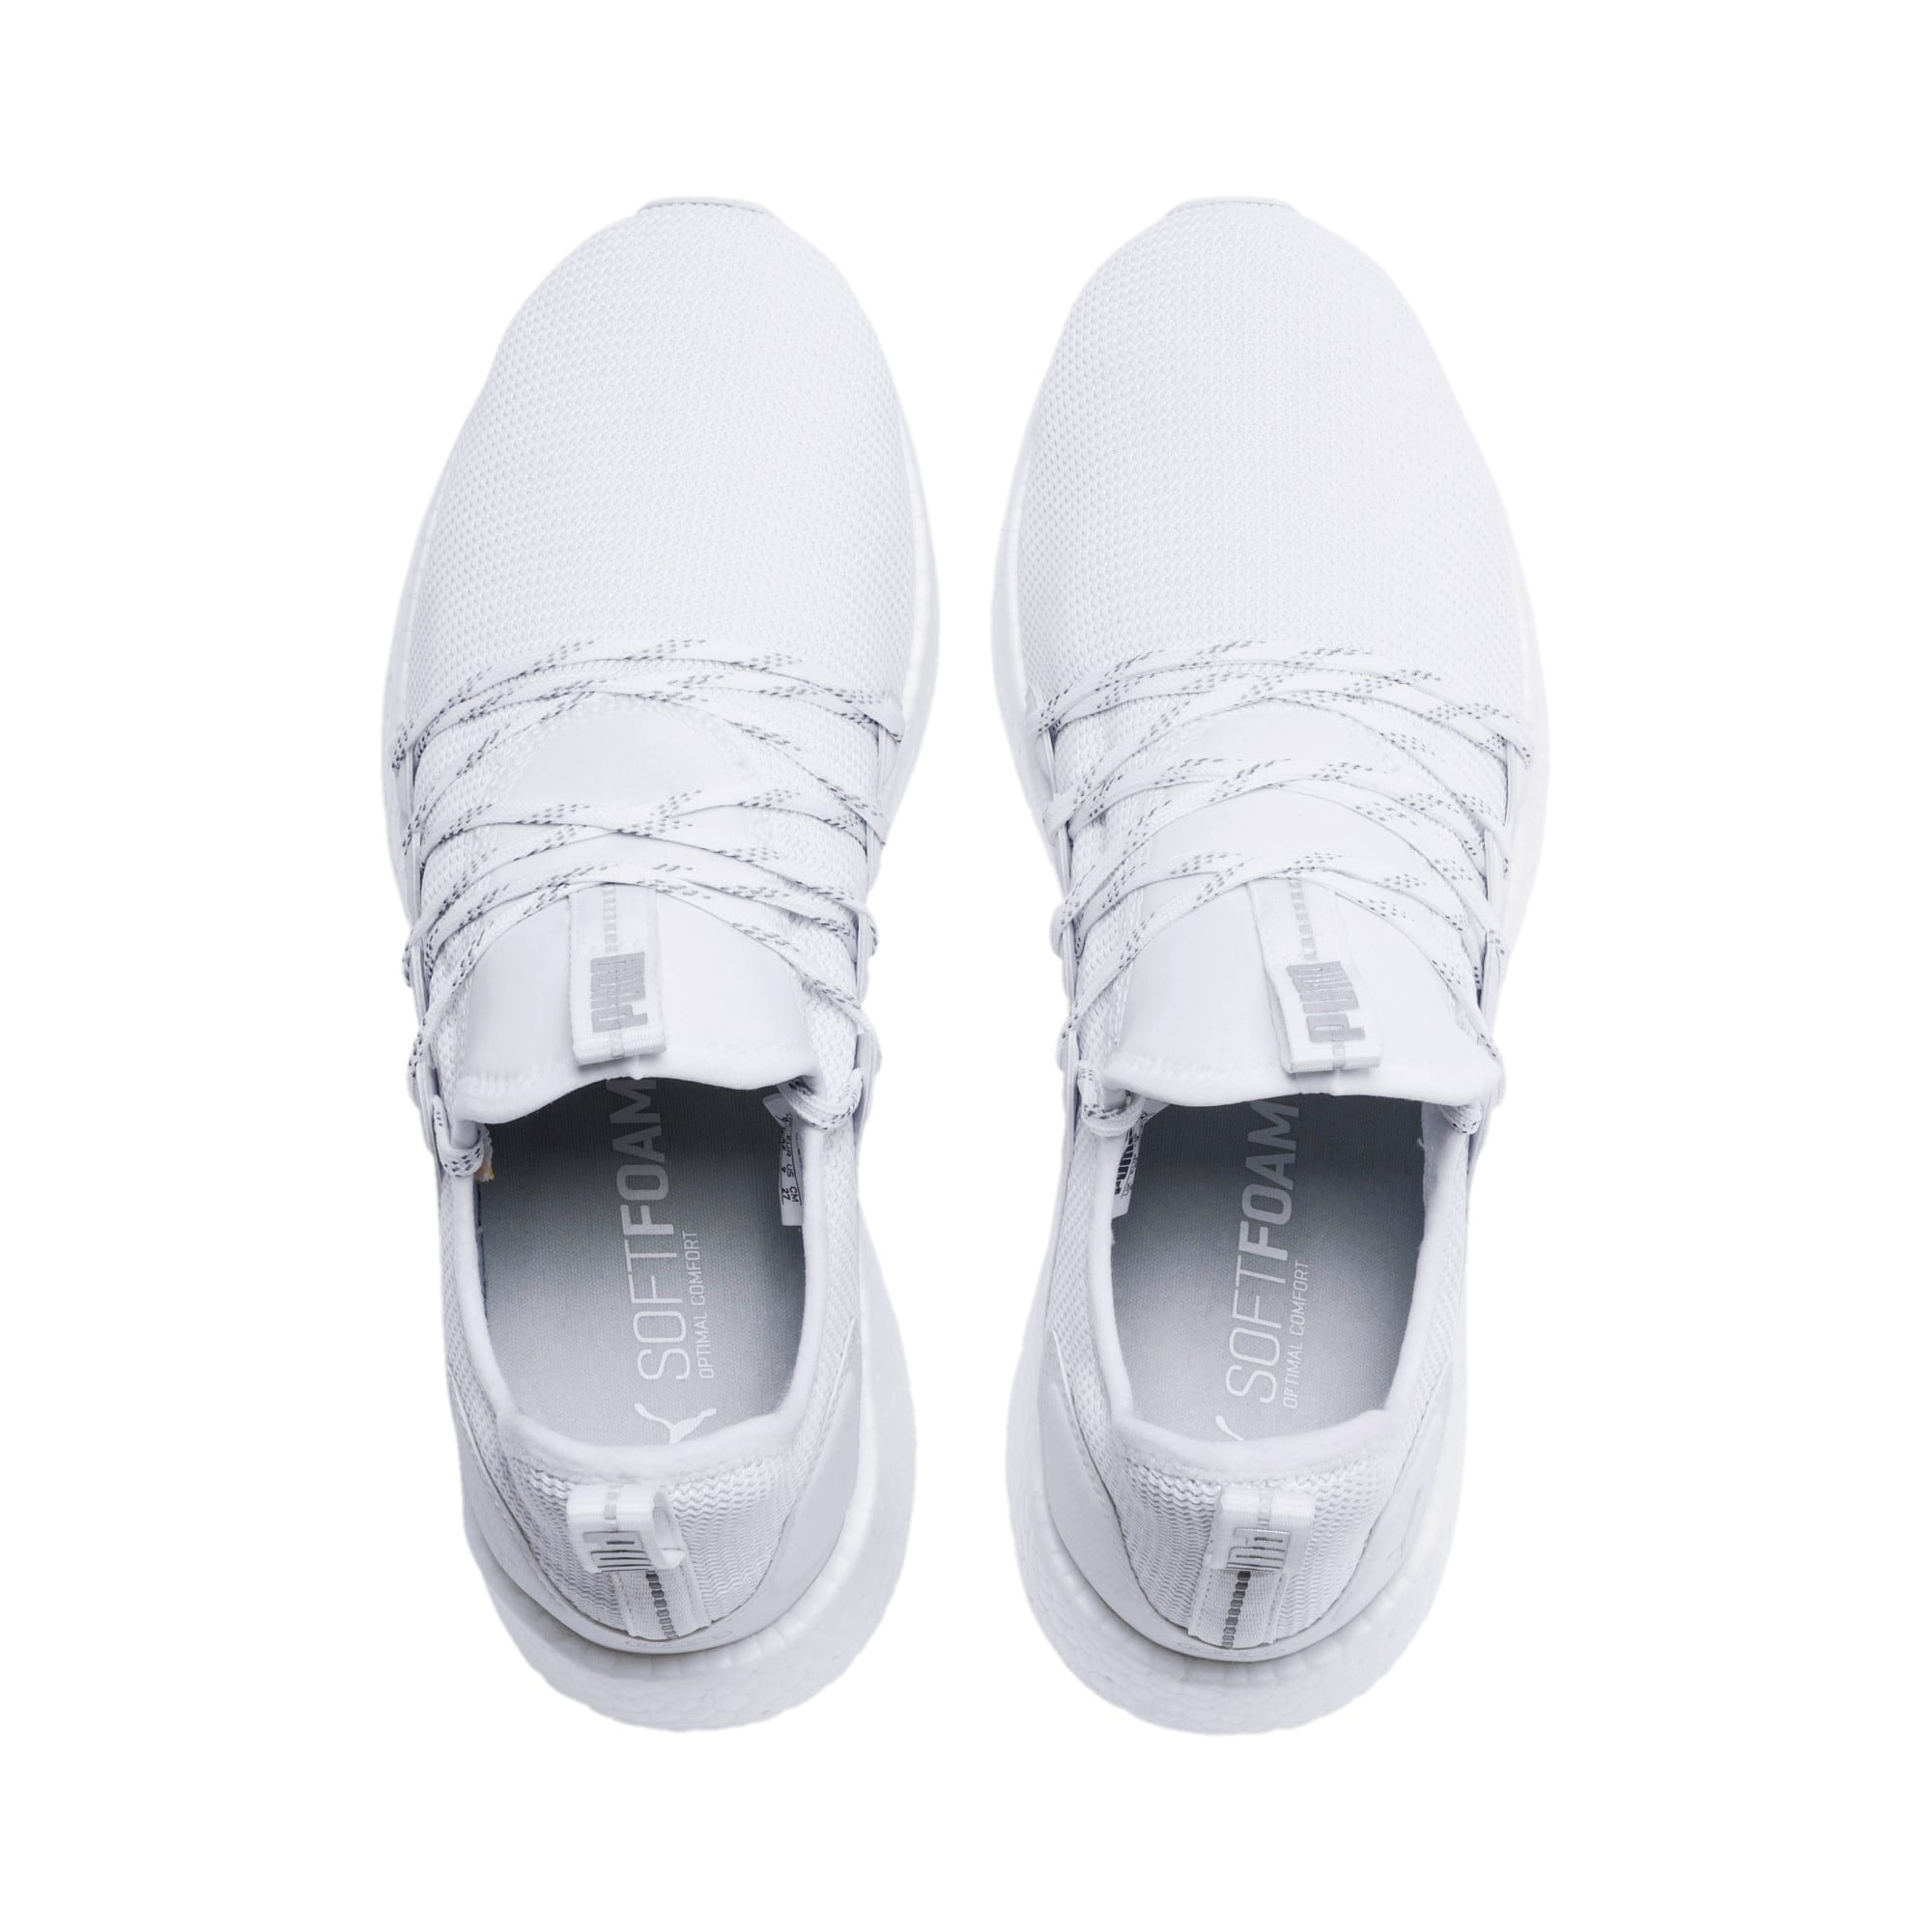 Thumbnail 4 of NRGY Neko Lights Men's Running Shoes, Puma White, medium-IND